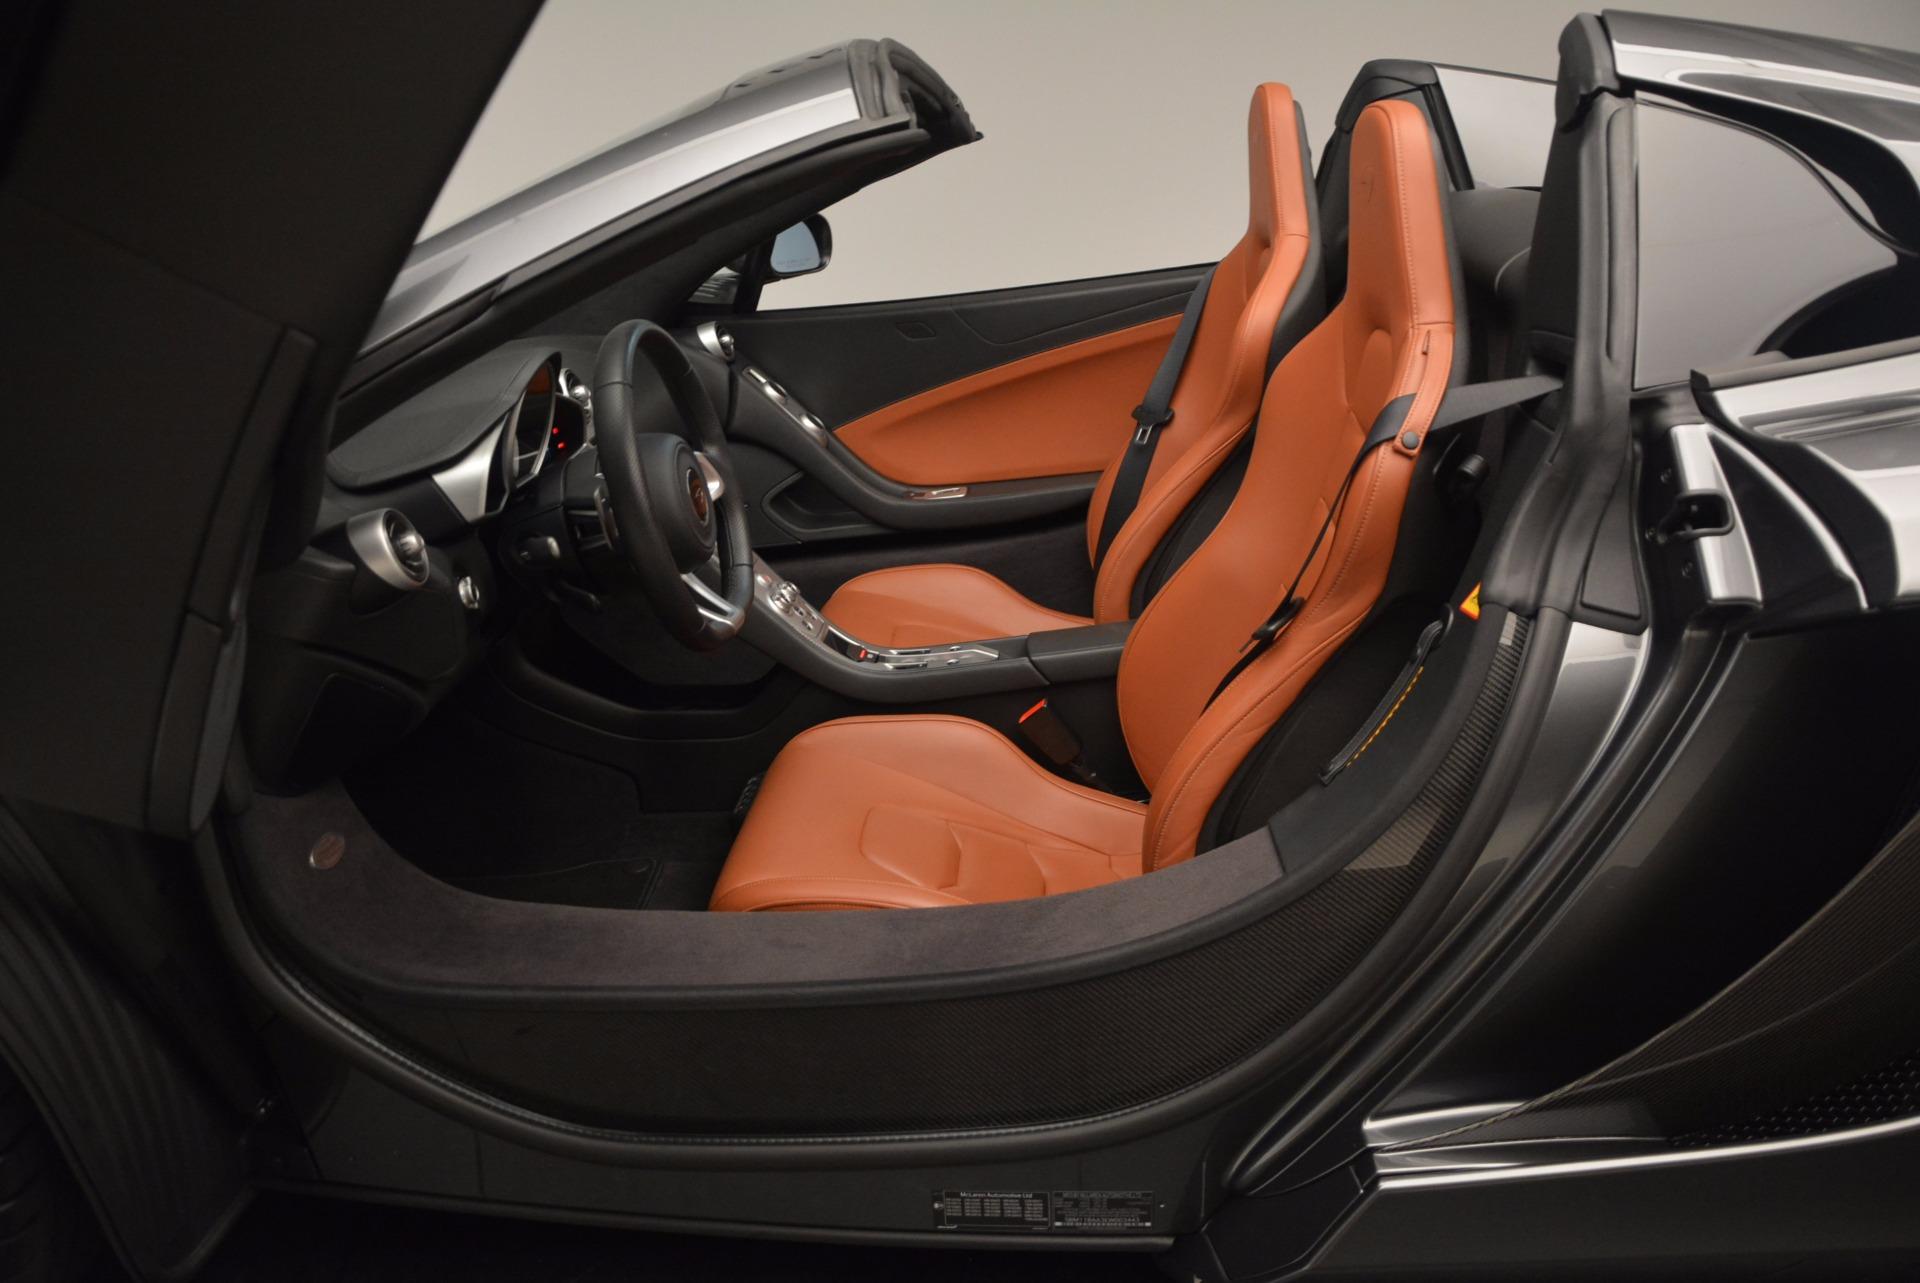 Used 2014 McLaren MP4-12C Spider  For Sale In Westport, CT 1510_p30